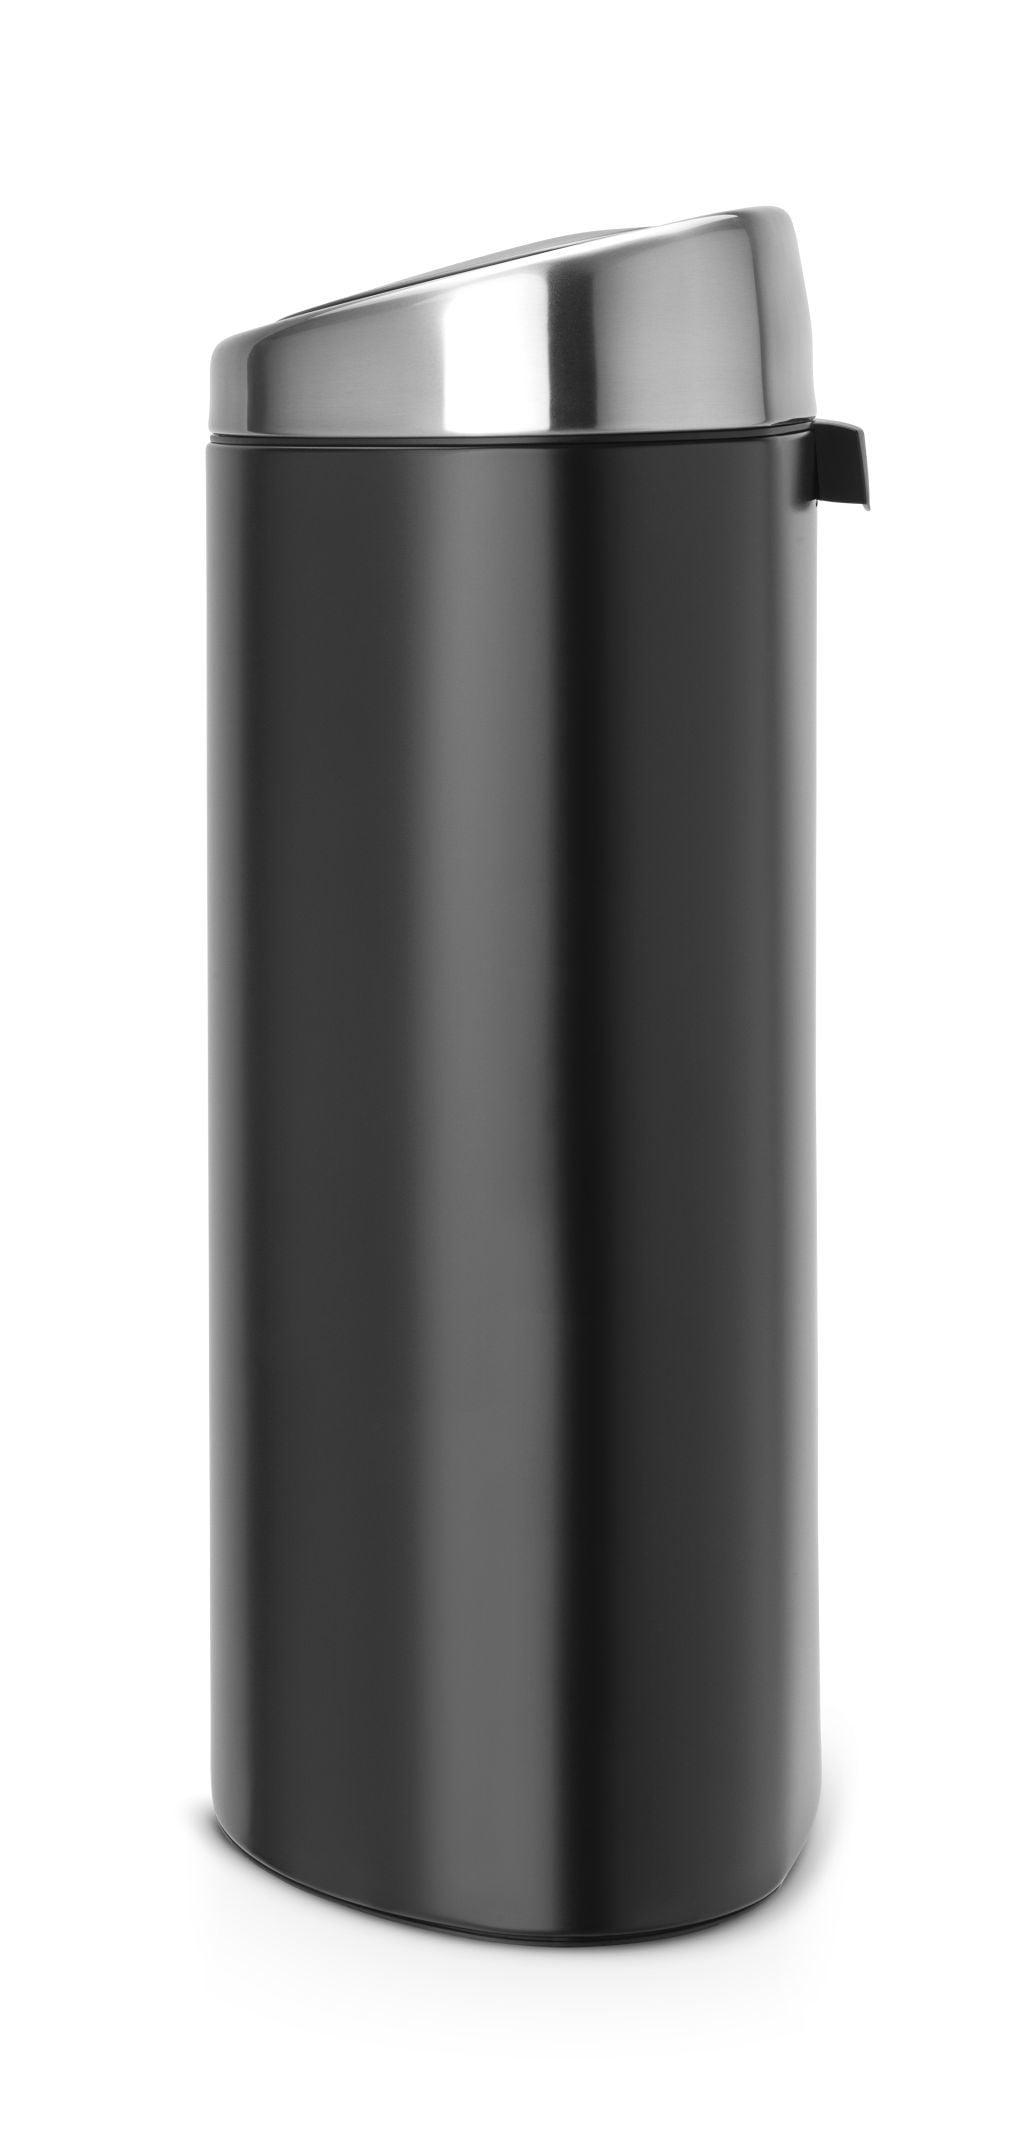 Brabantia Prullenbak 40 Liter.Brabantia Touch Bin 40 Liter Matt Black Matt Coppens Warenhuis